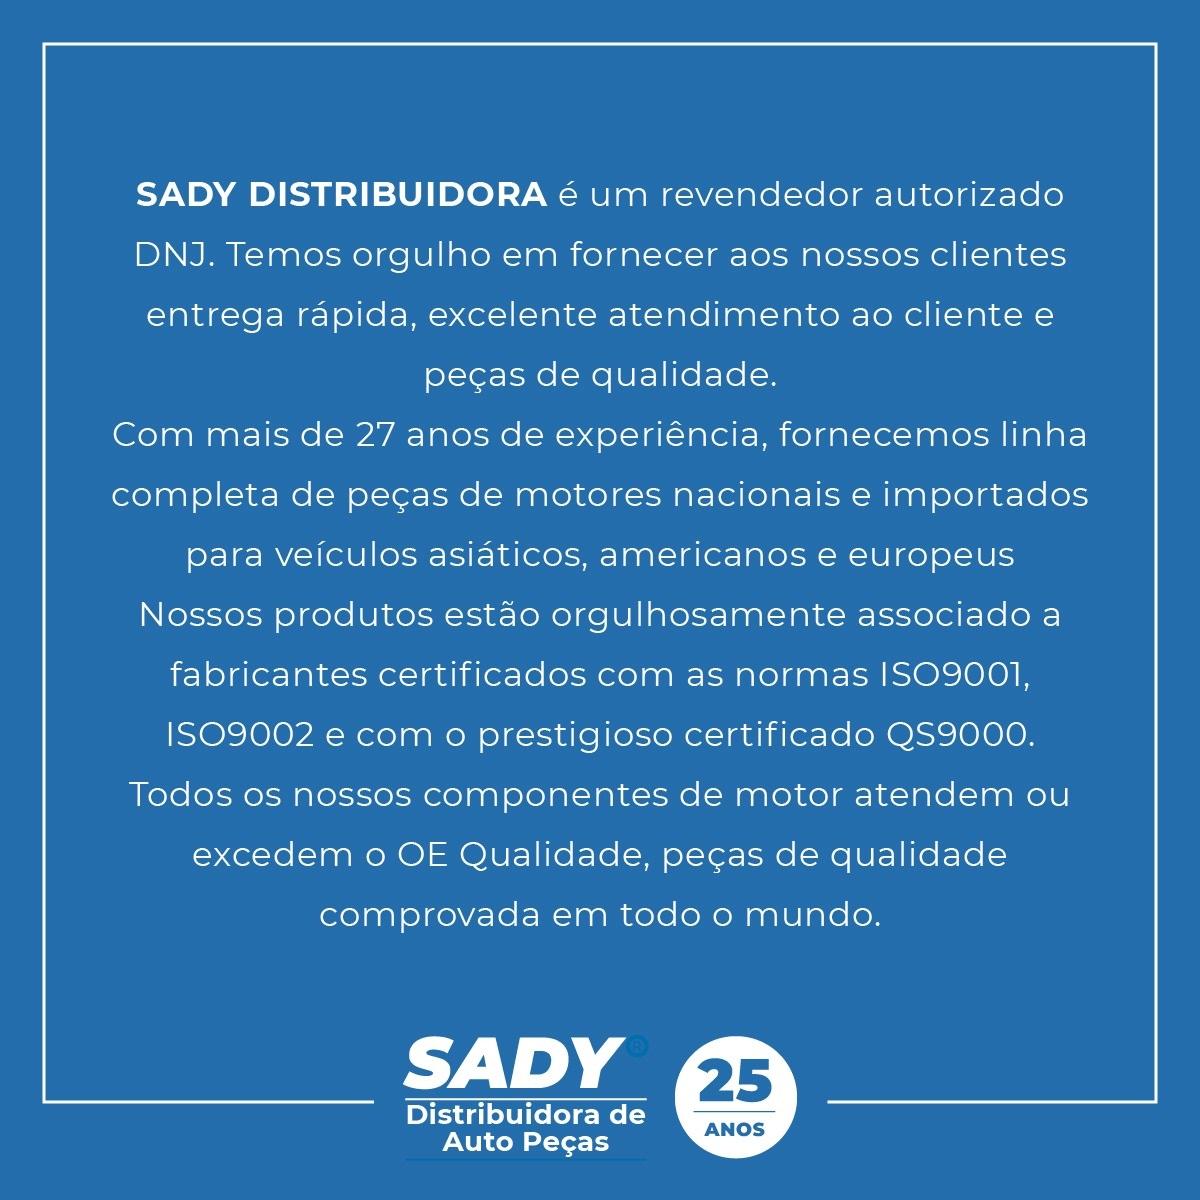 BOMBA DE OLEO DO MOTOR GM 1.6/1.8 16V ECOTEC